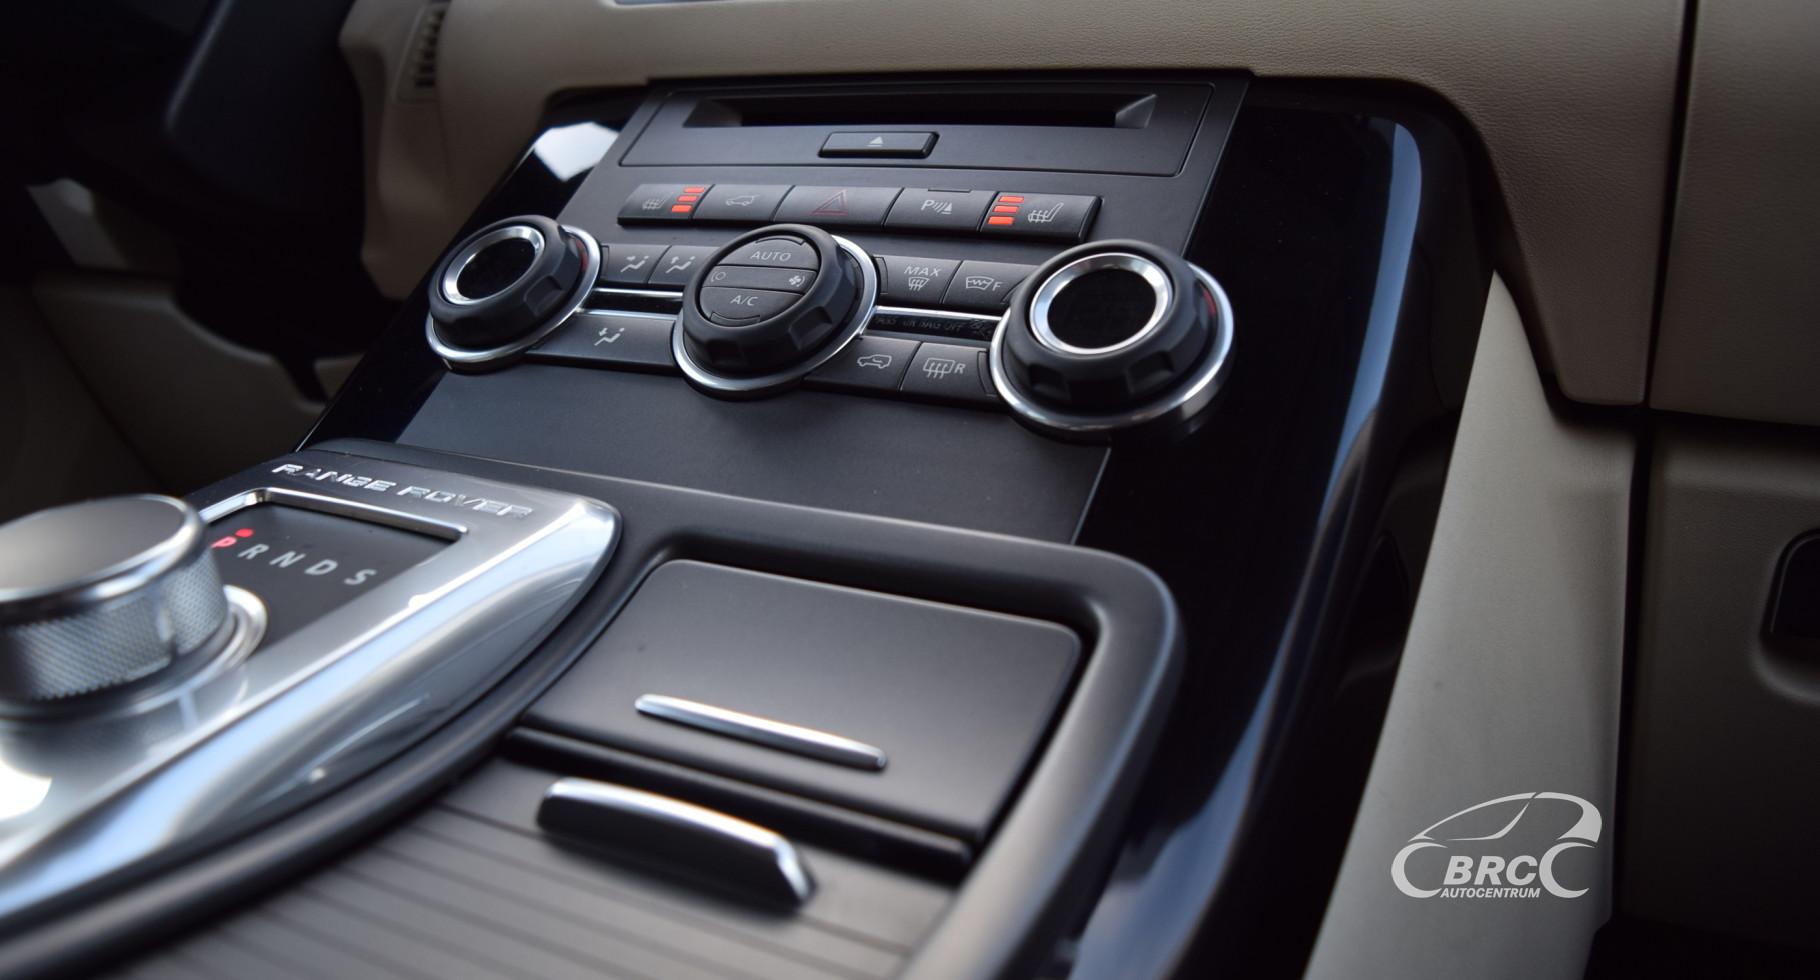 Land-Rover Range Rover Sport Autobiography